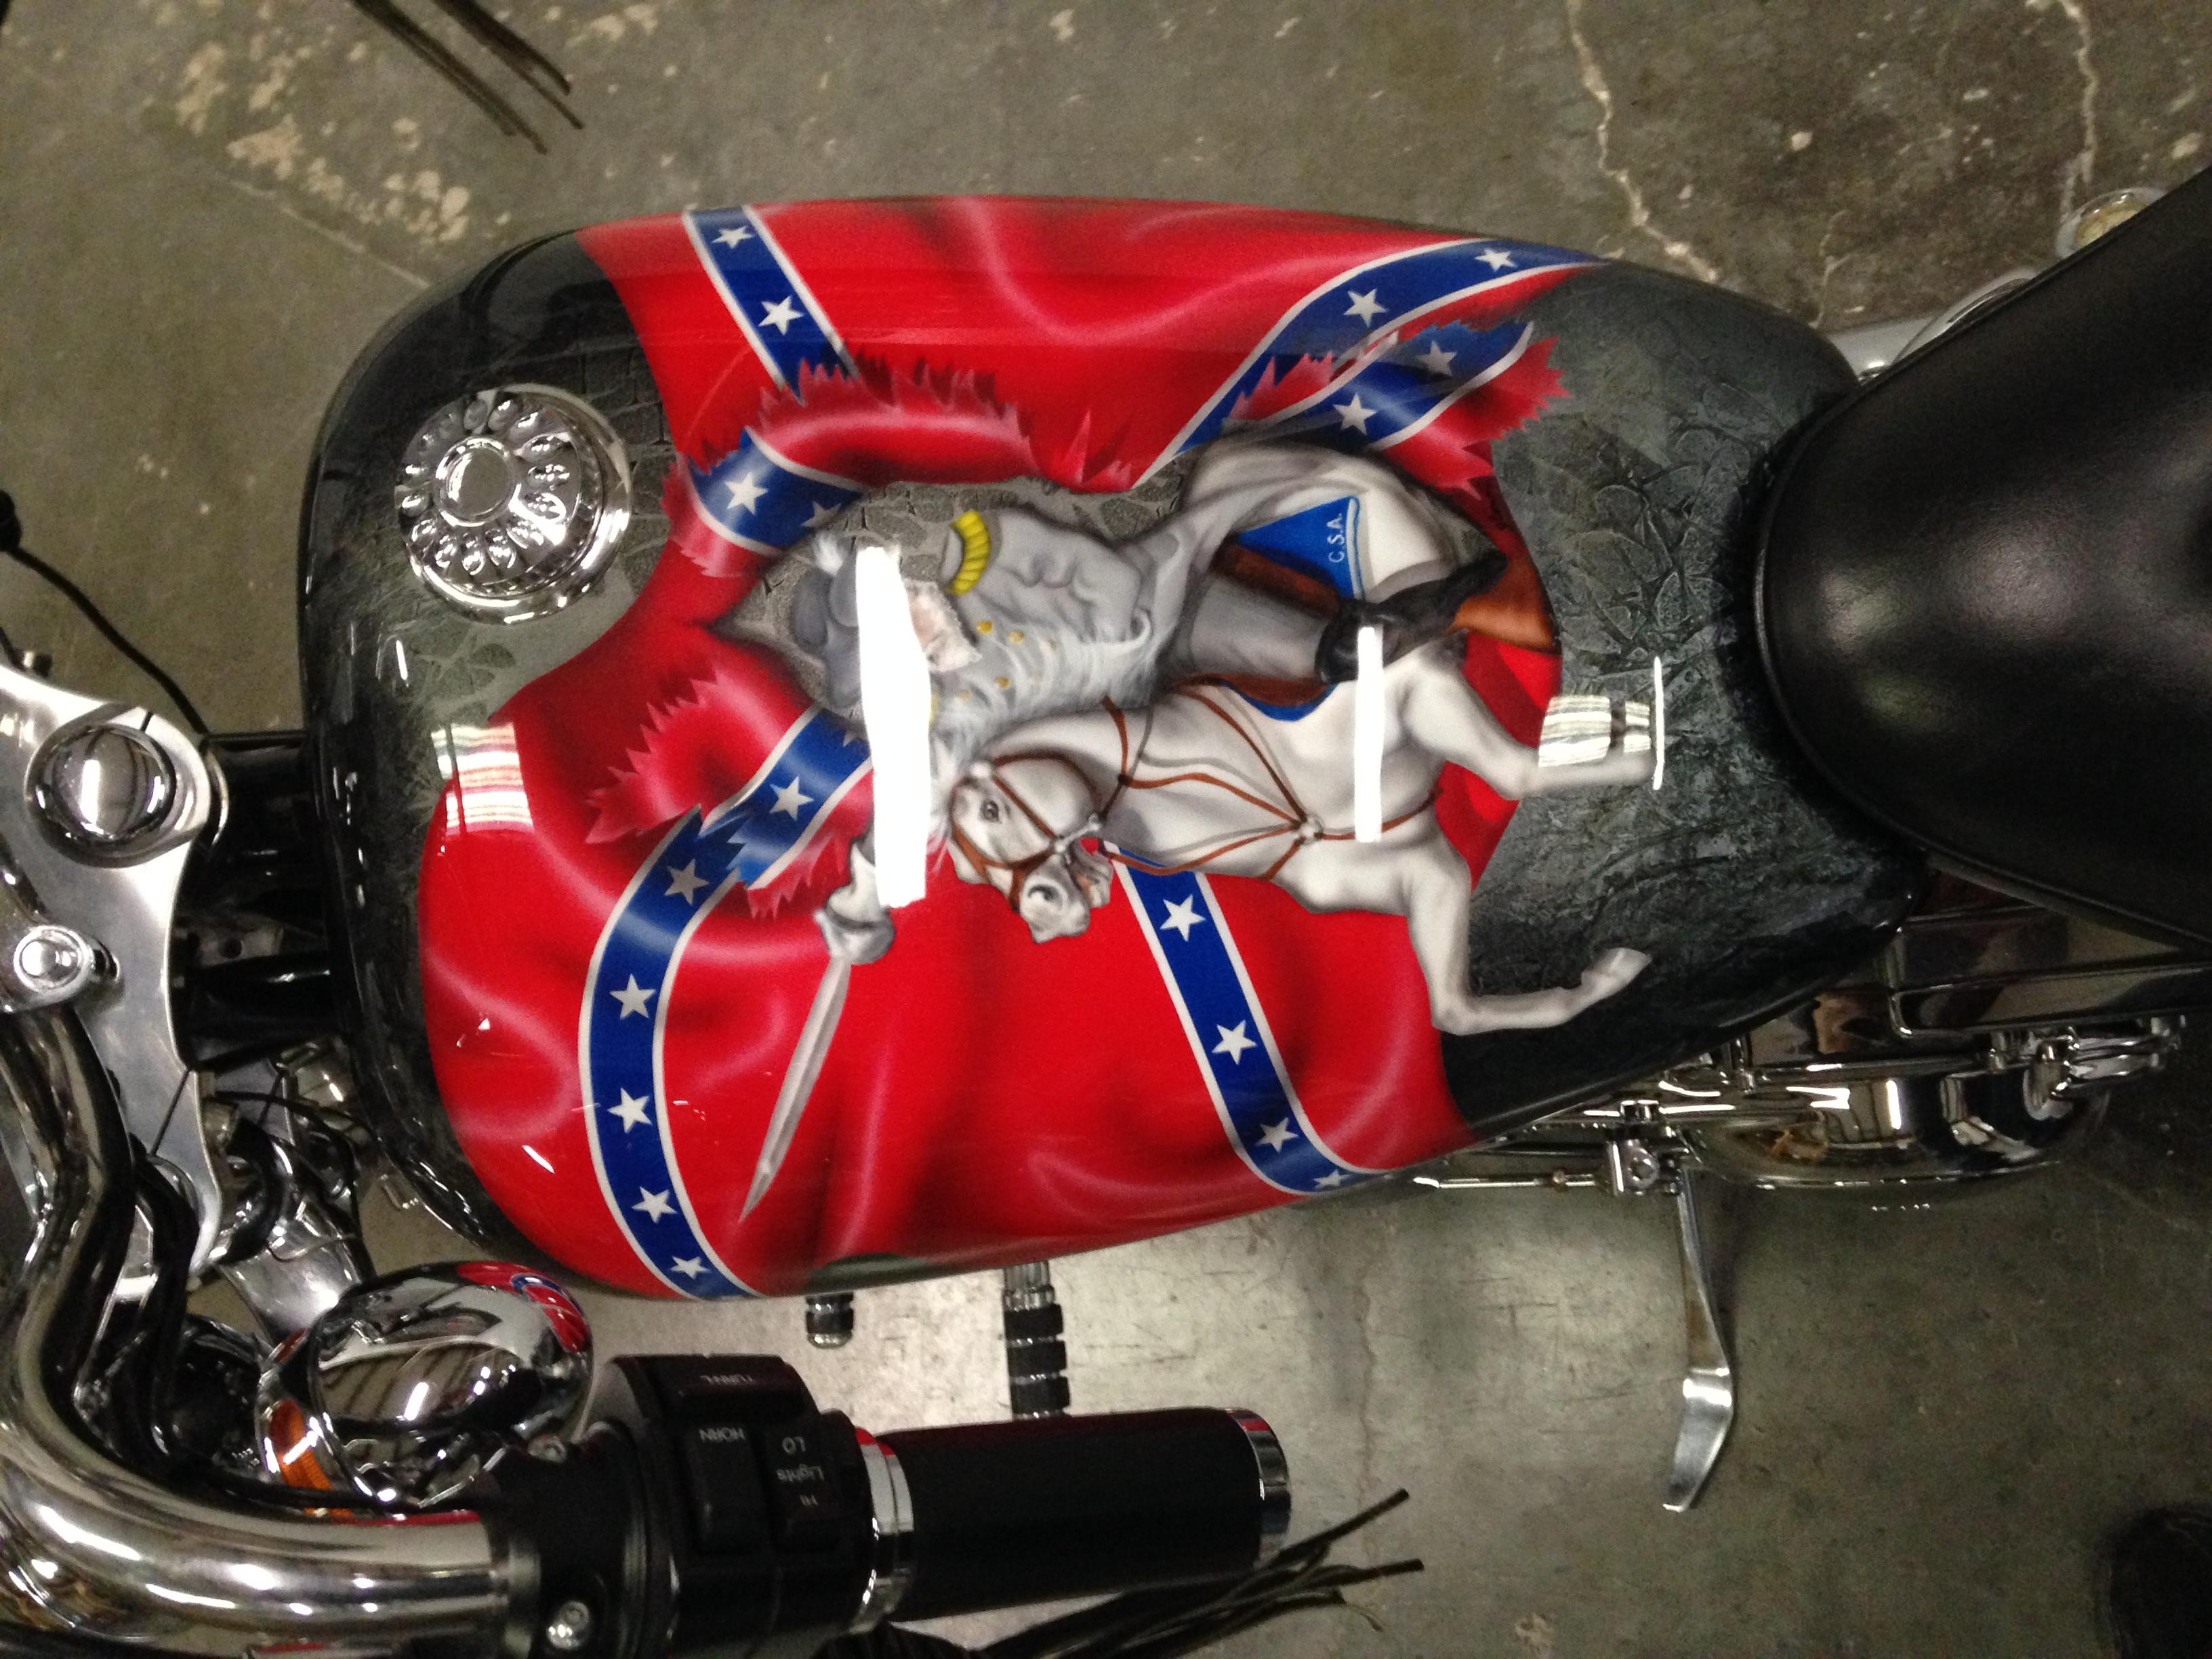 Angeles Silver Rider Replacement Parts : Harley davidson custom frames sale tapdance